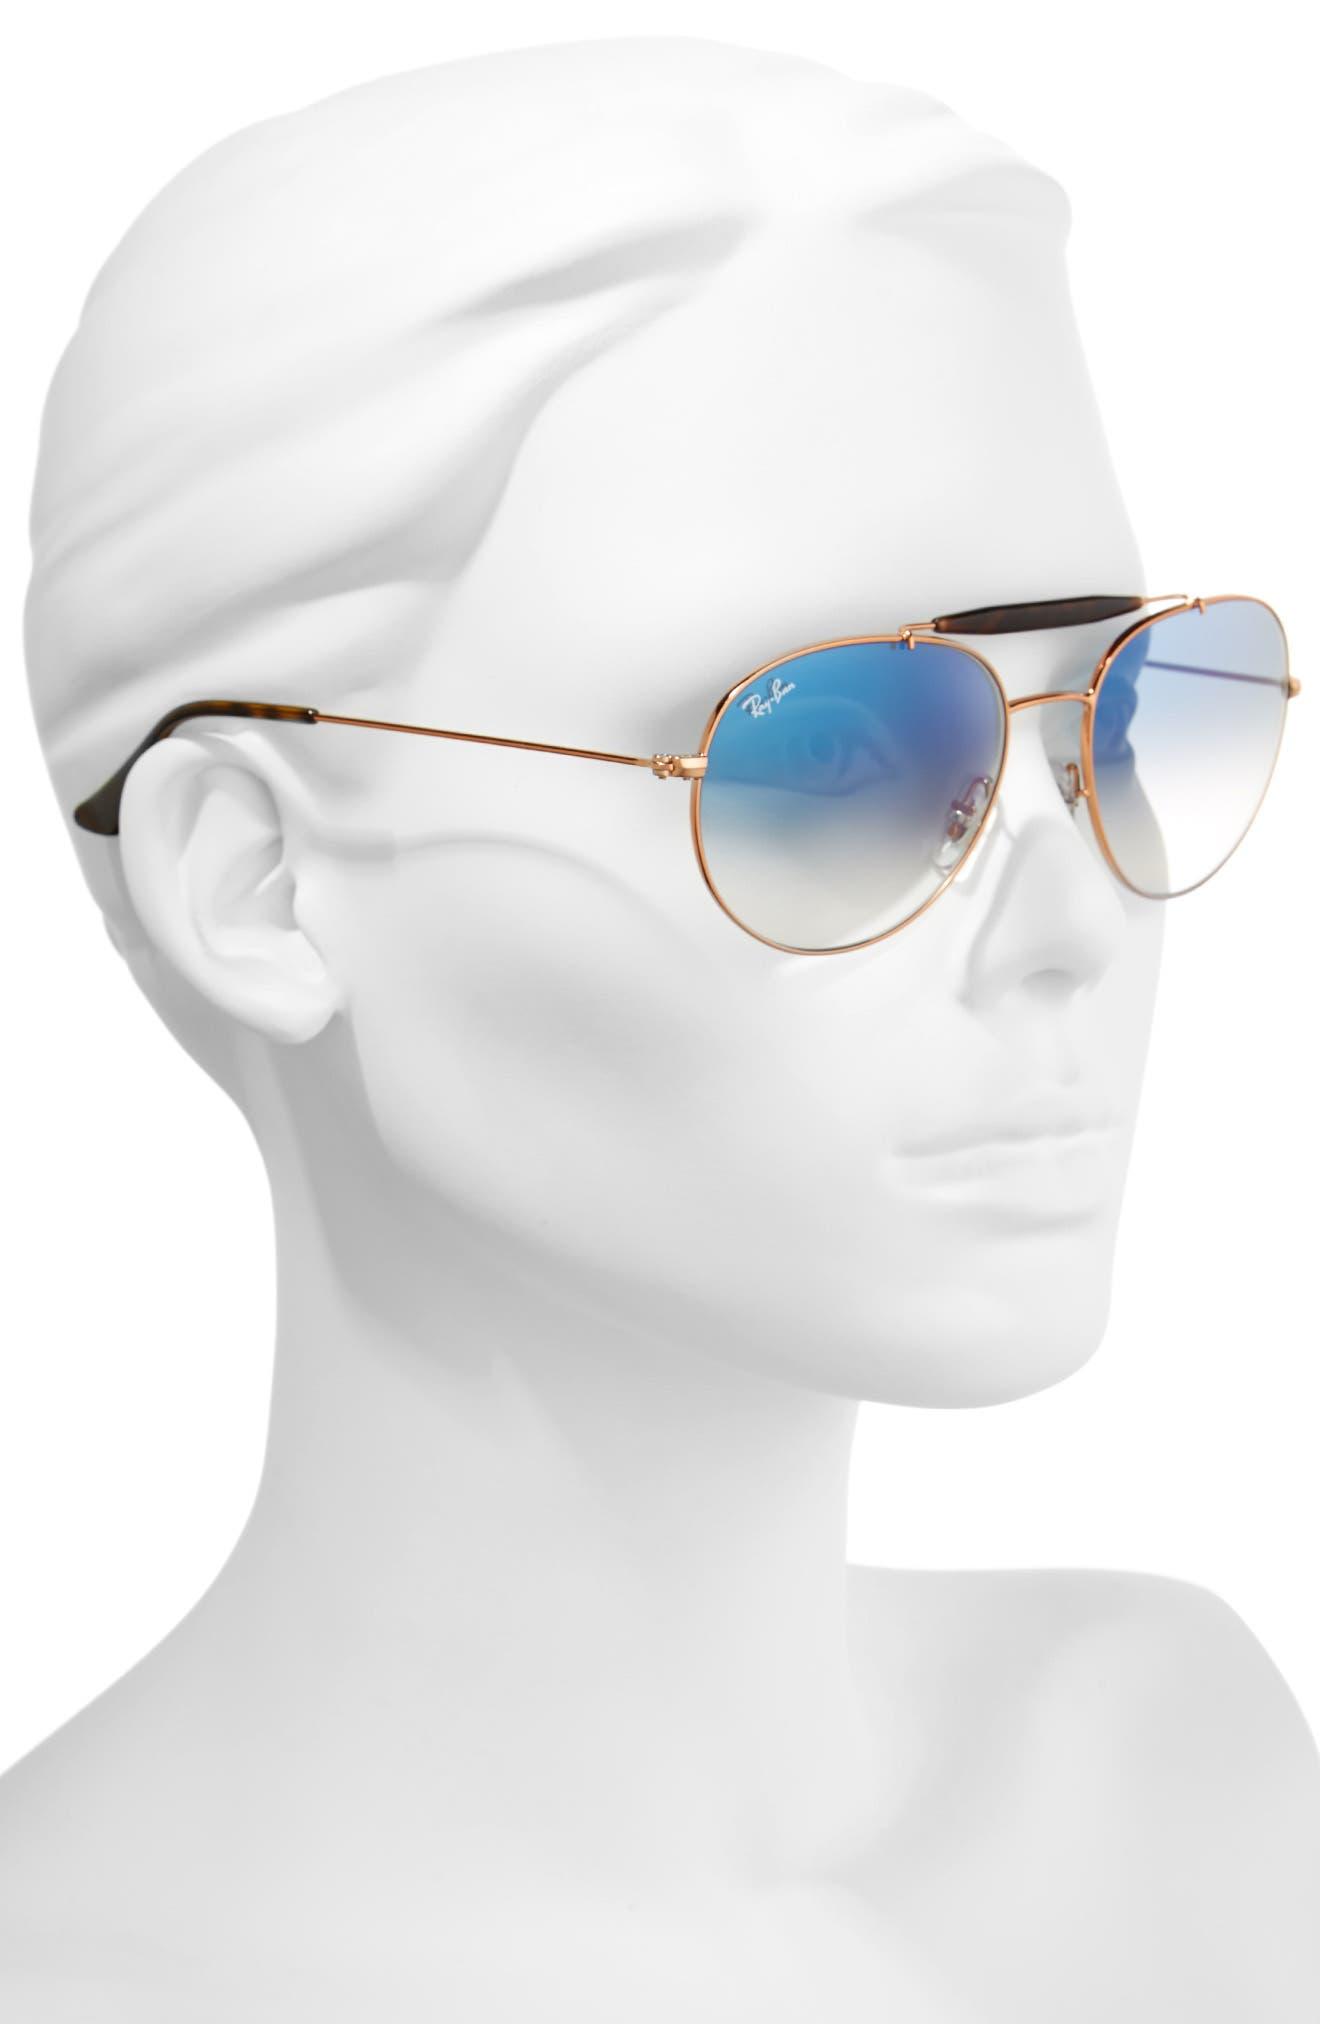 Highstreet 56mm Sunglasses,                             Alternate thumbnail 2, color,                             220